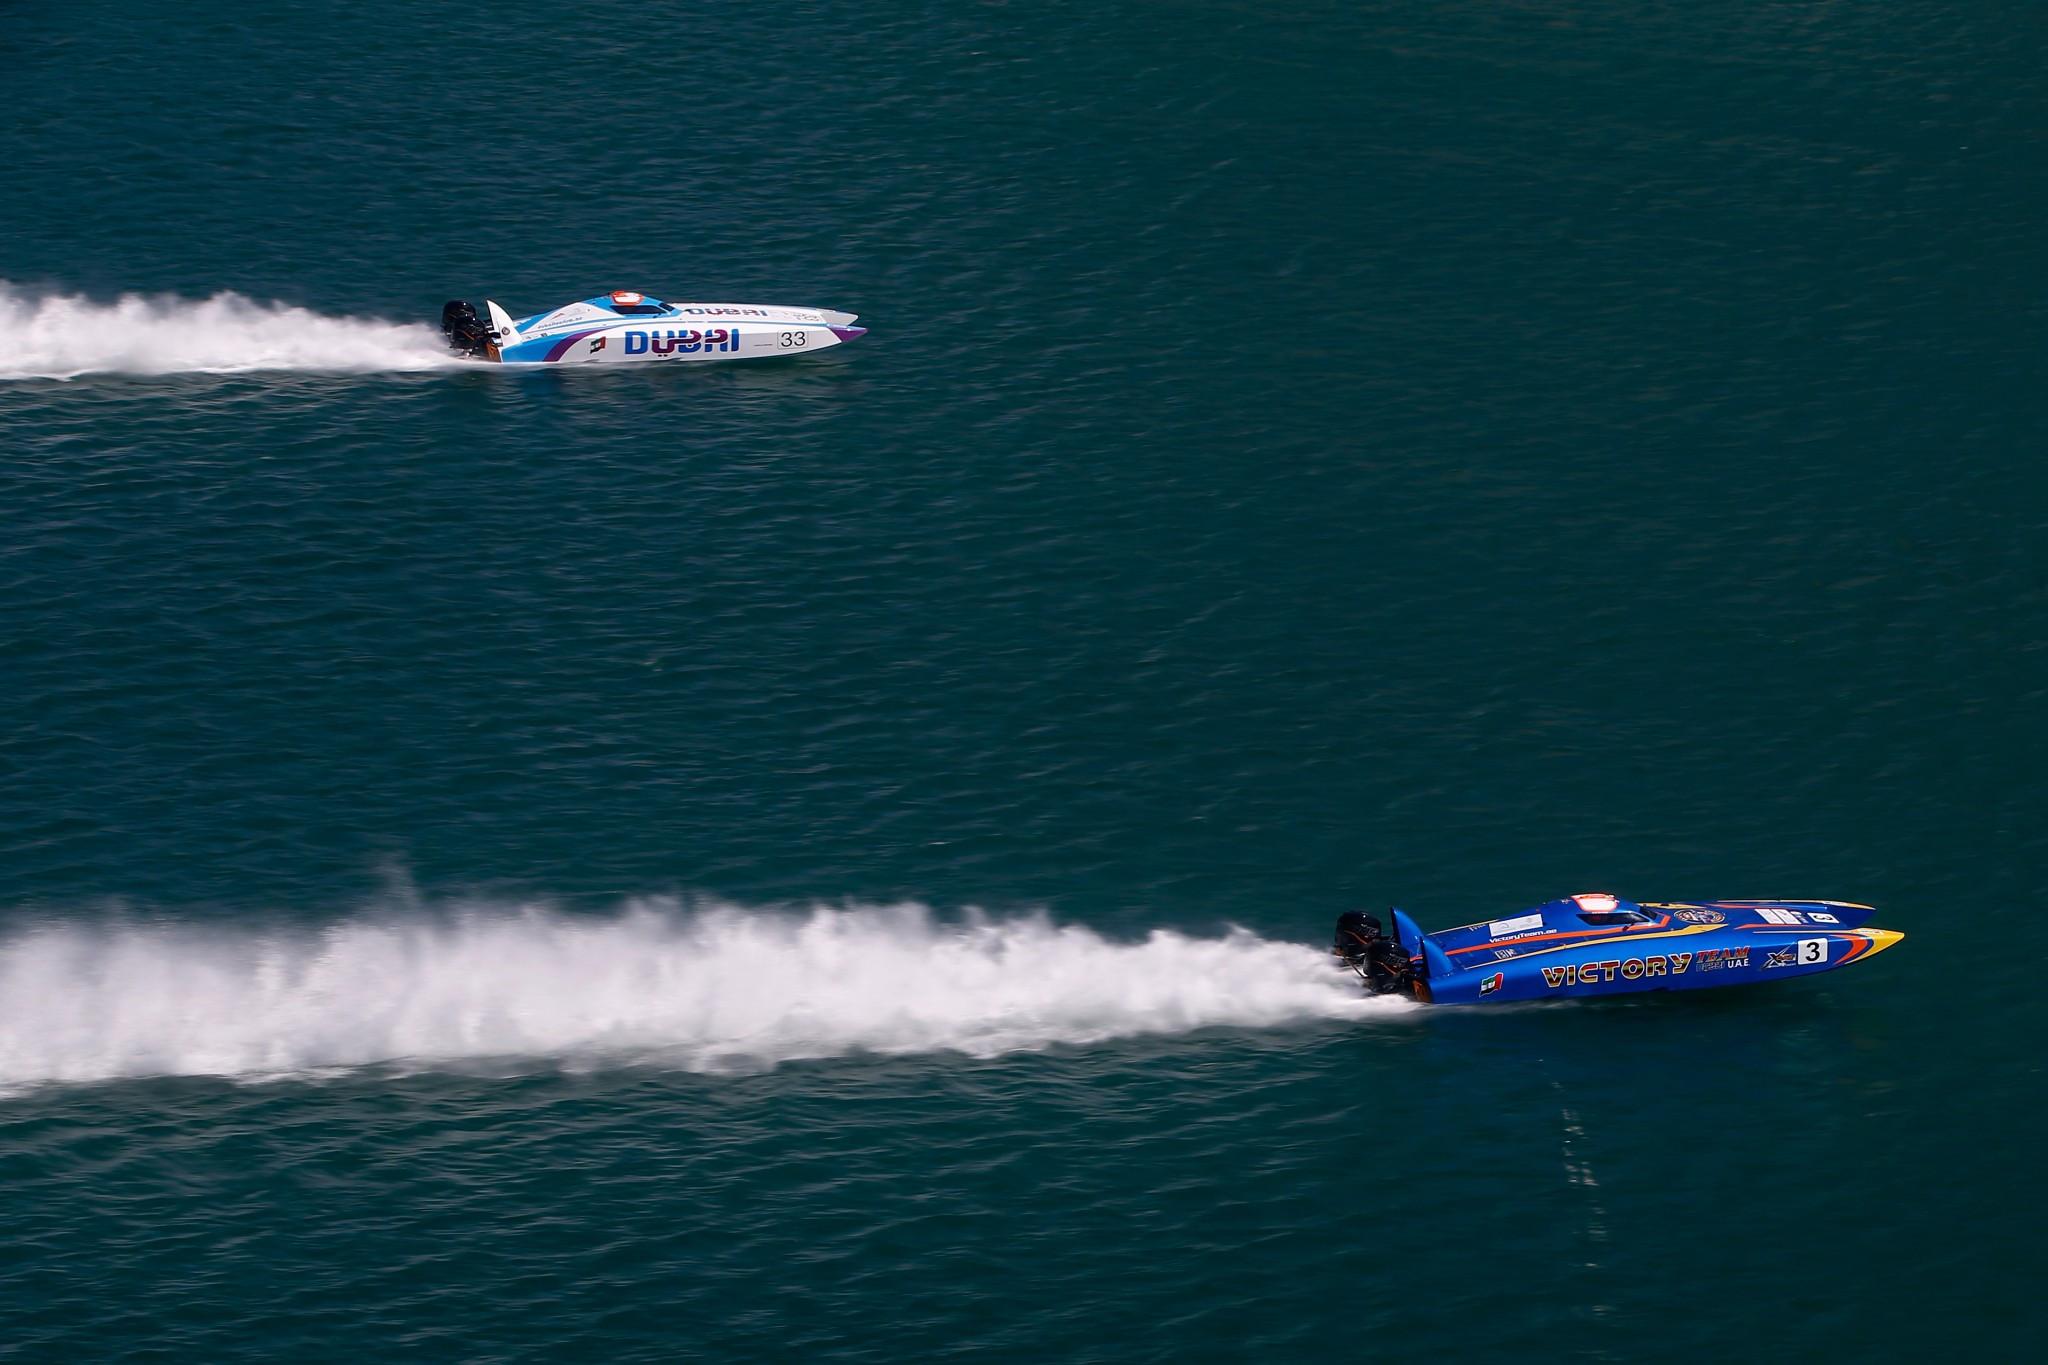 China and United Arab Emirates to host rounds of XCAT World Championship